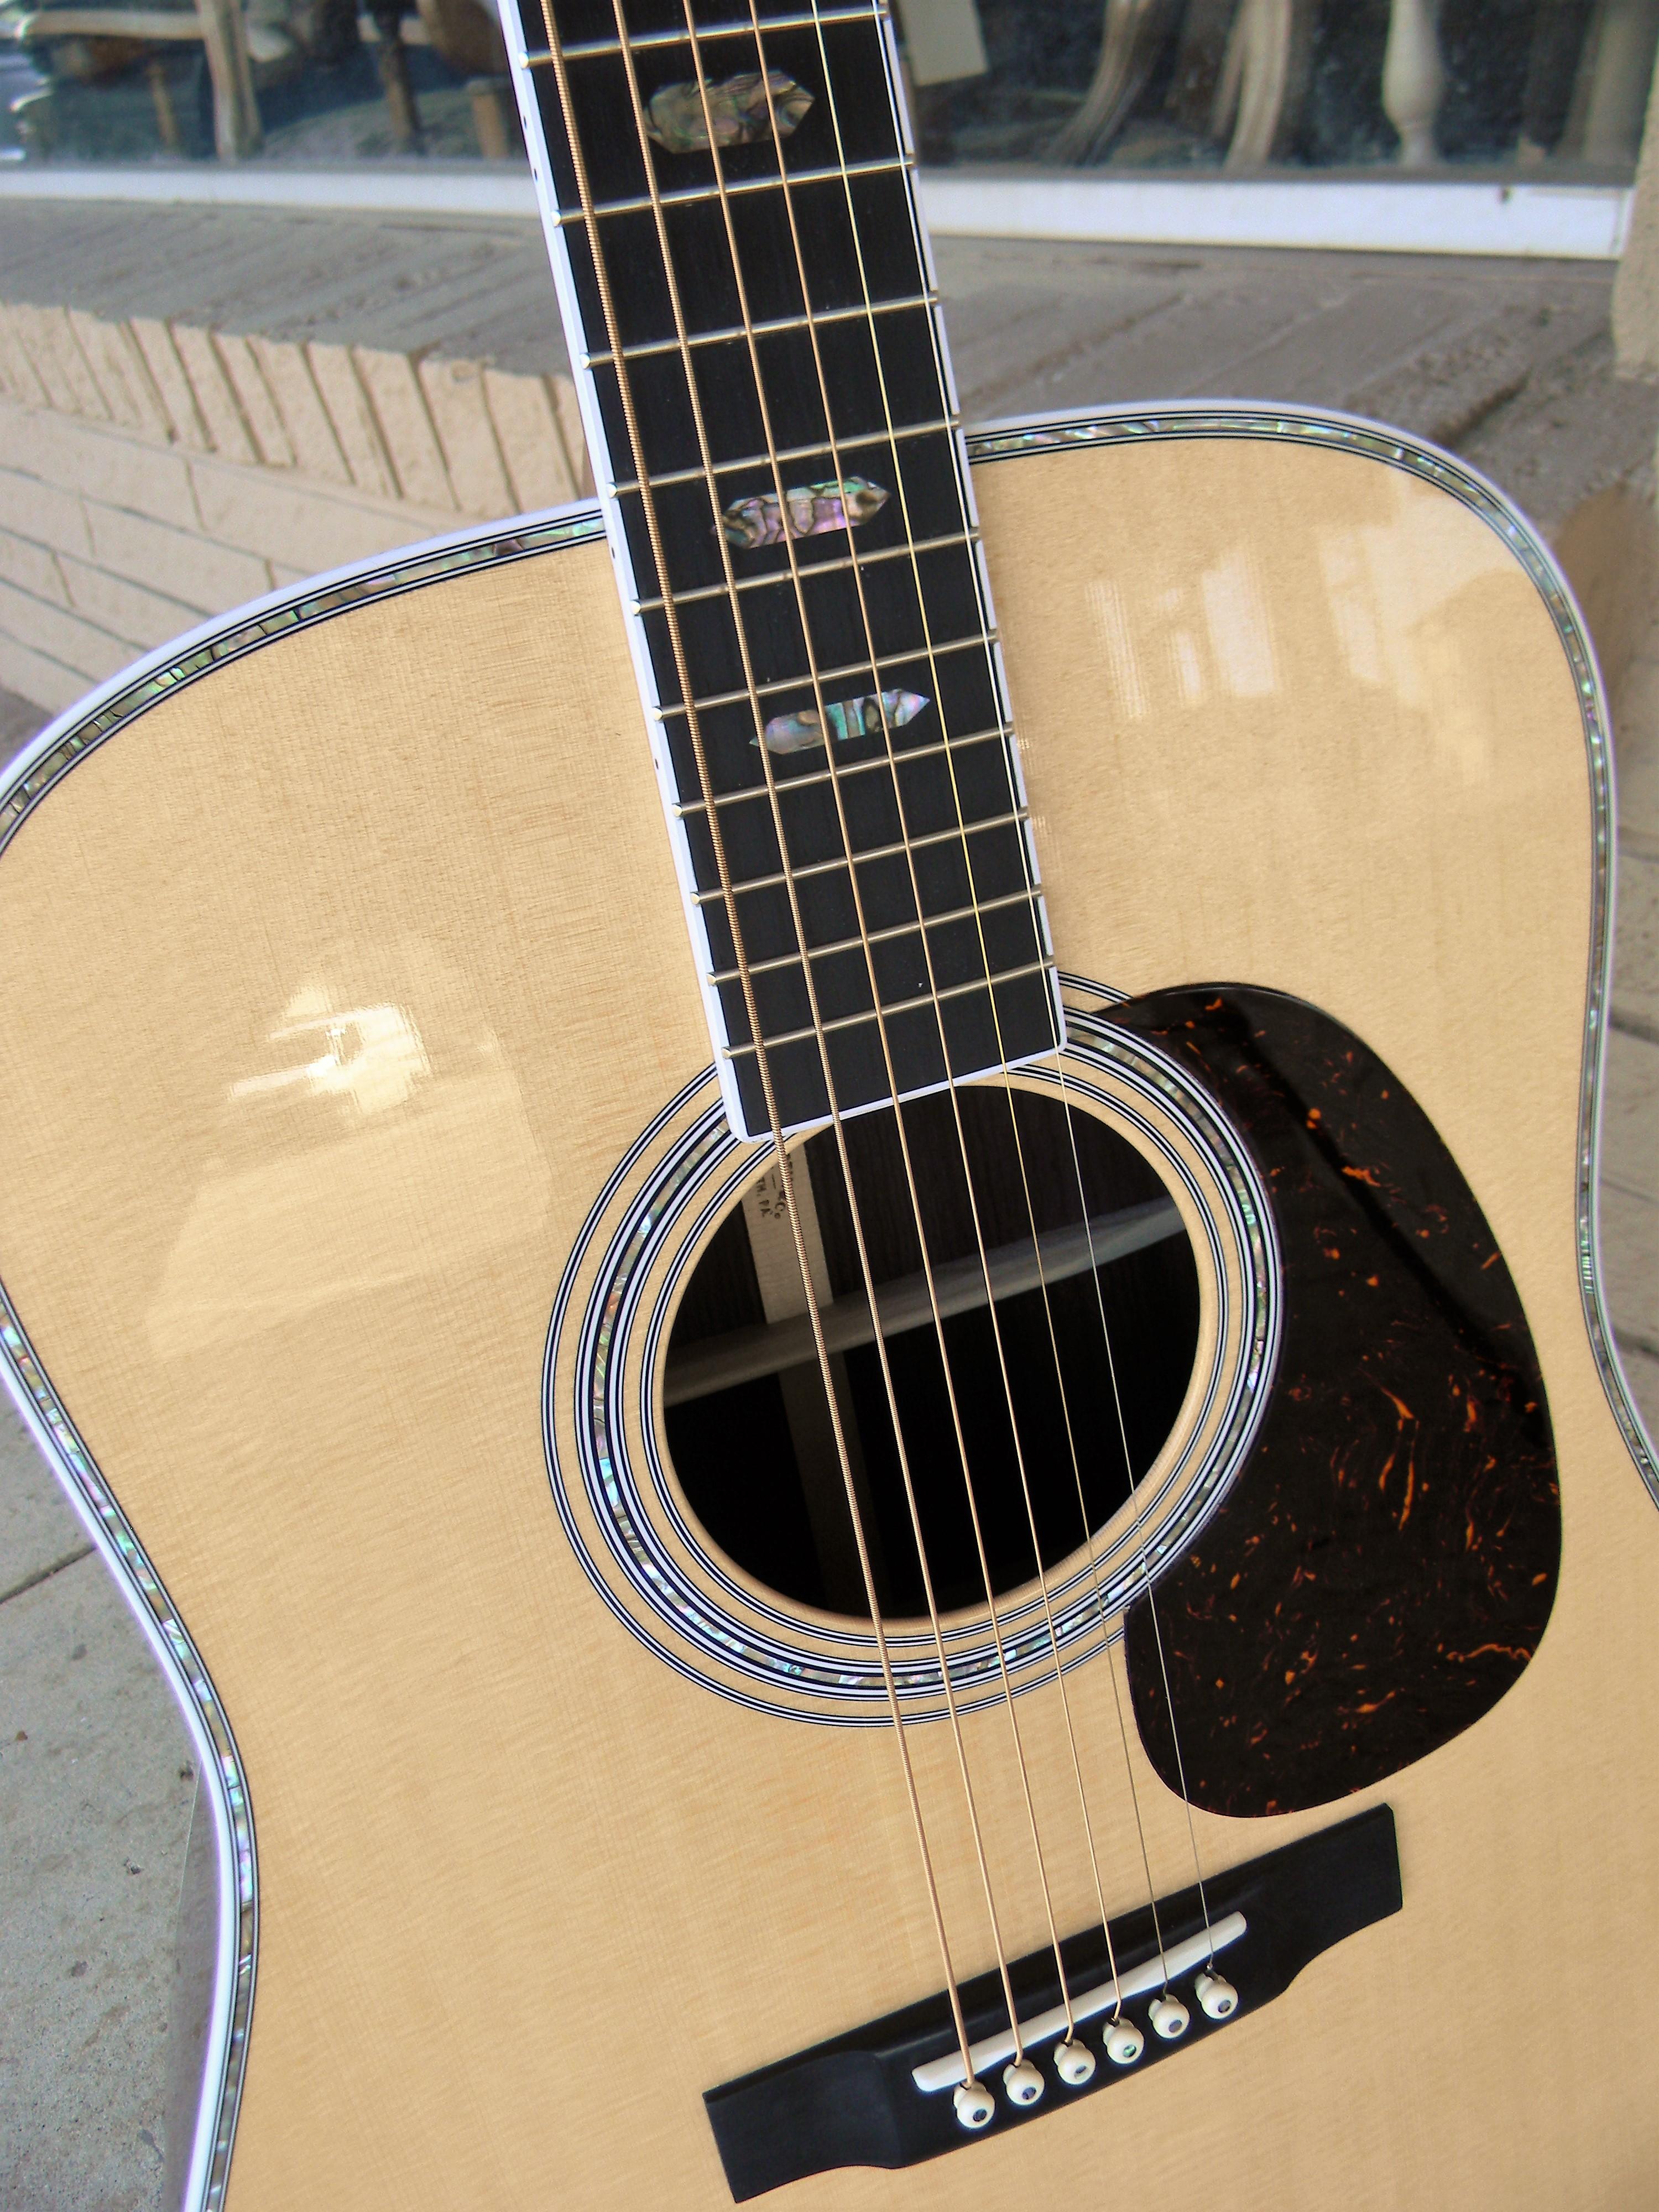 dscn6607 san antonio guitar store guitar tex. Black Bedroom Furniture Sets. Home Design Ideas